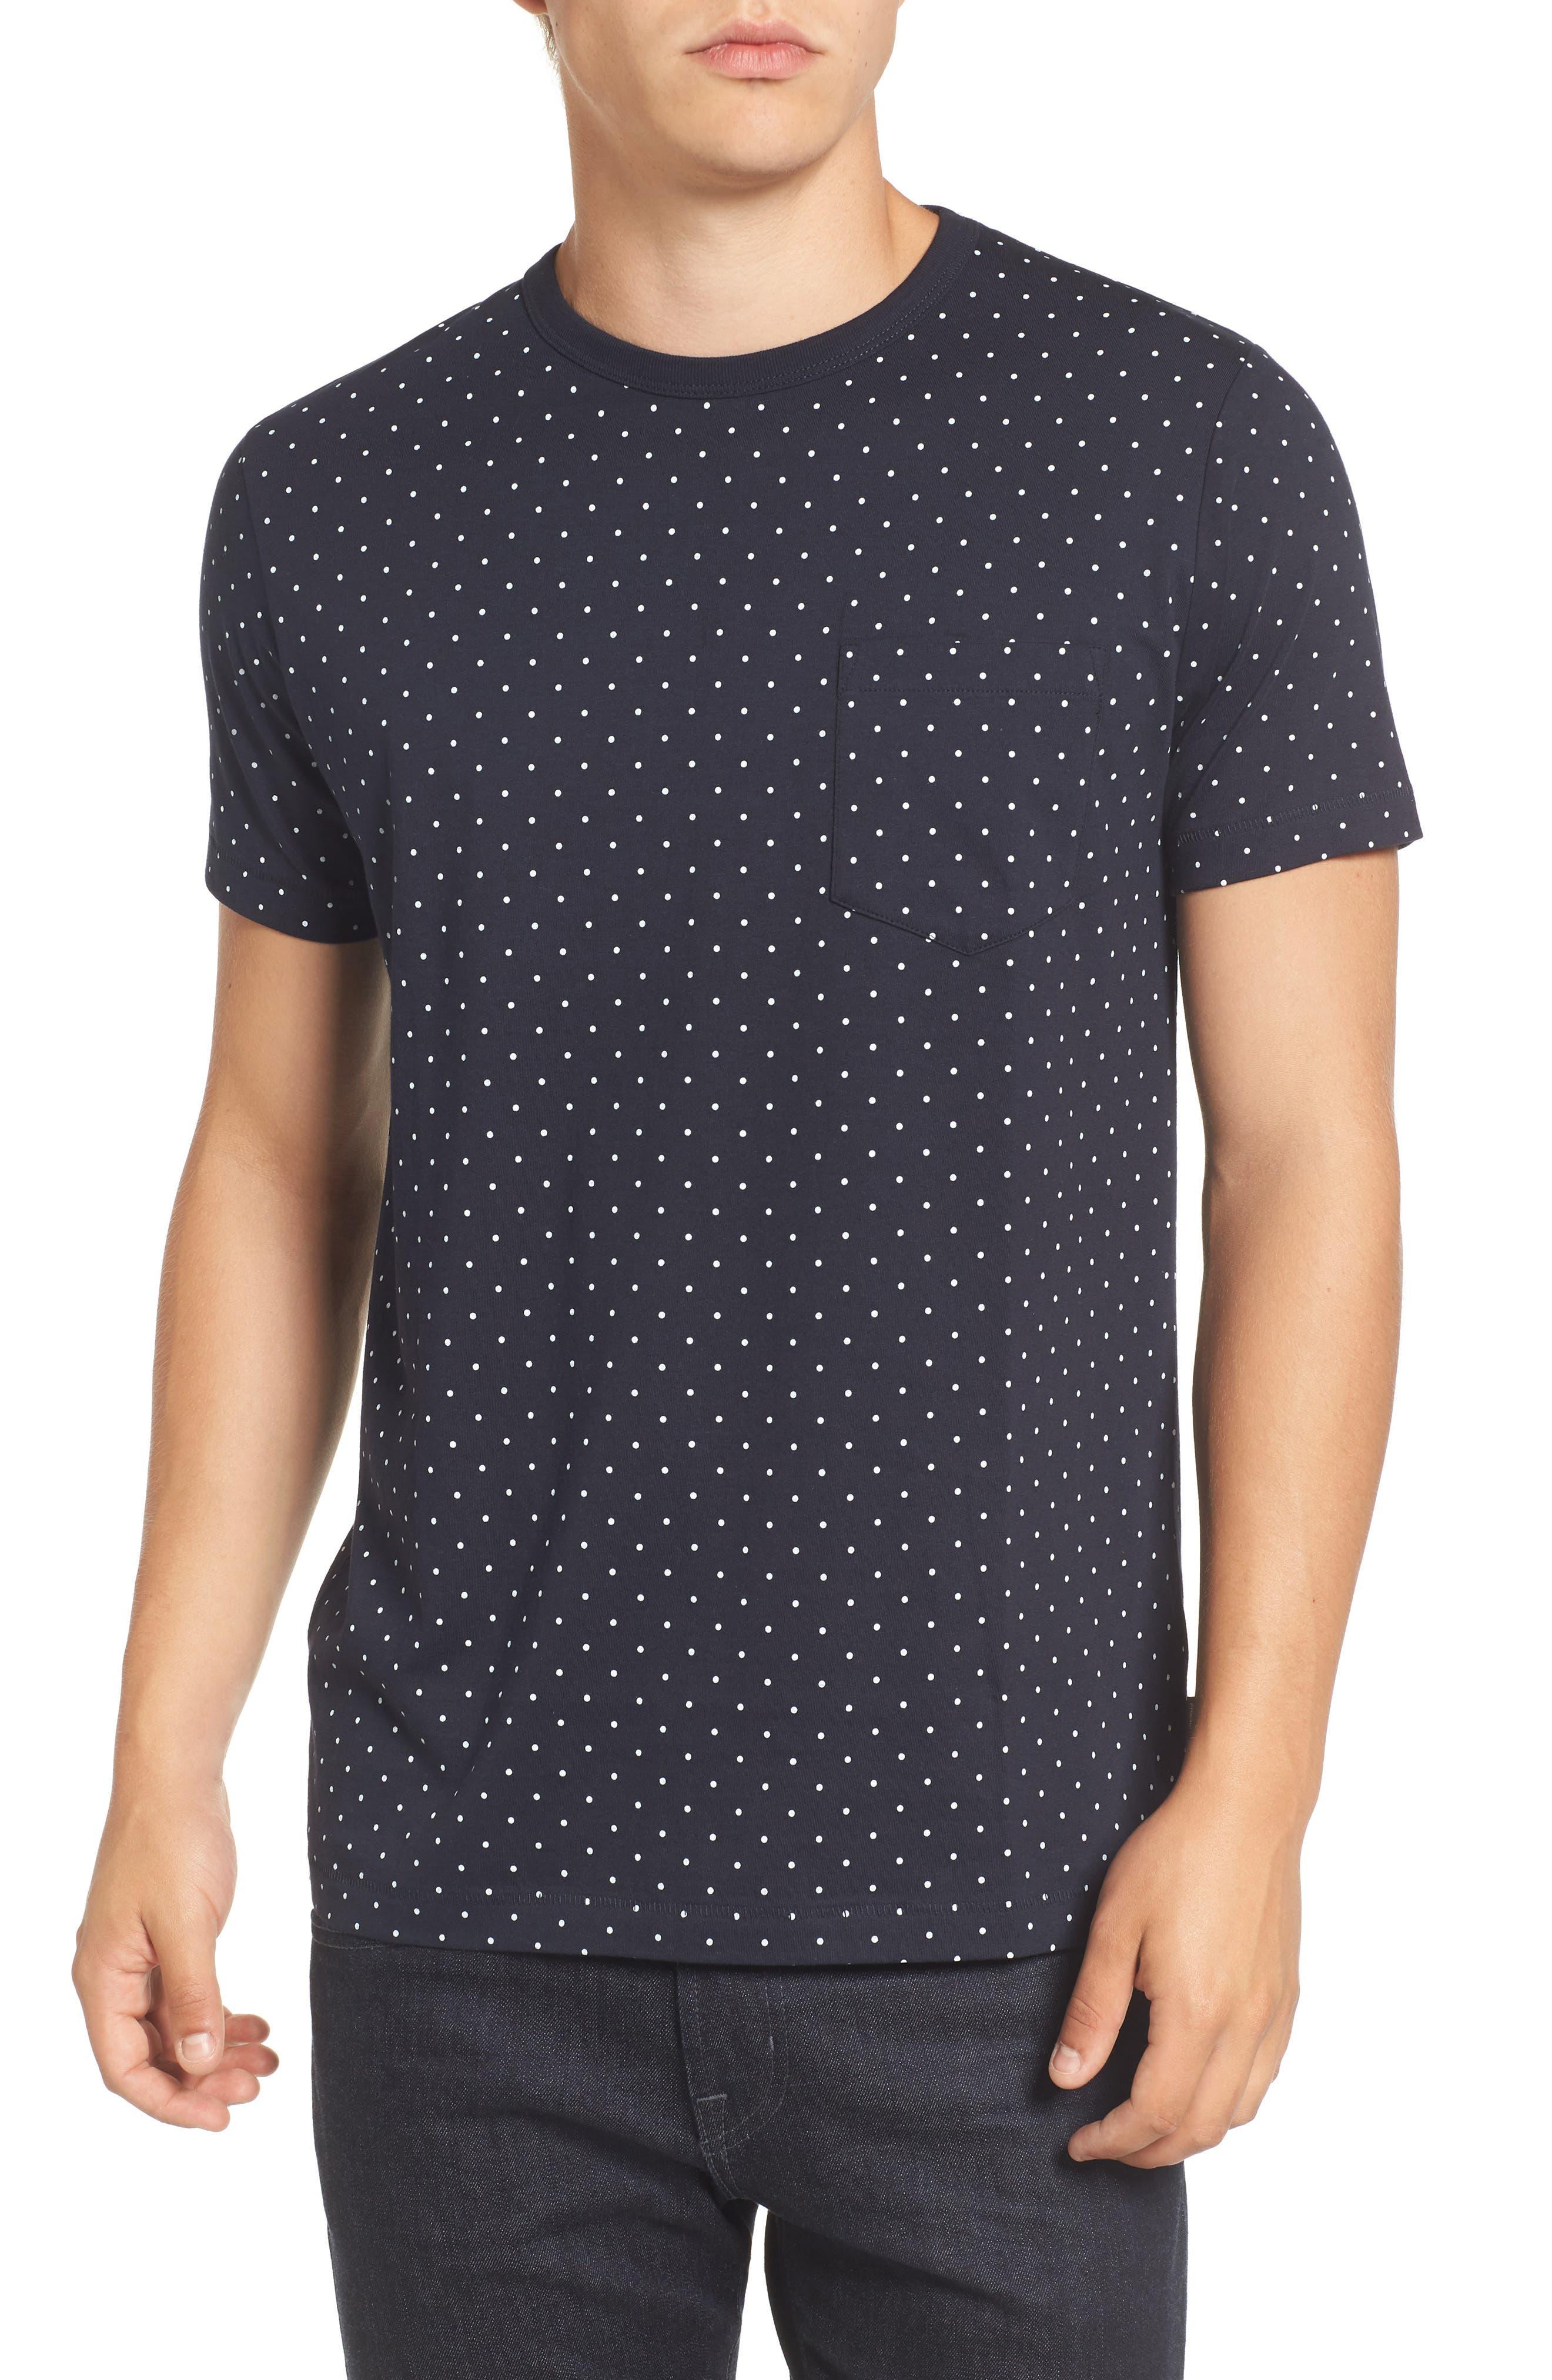 Spot Crewneck T-Shirt,                         Main,                         color, Marine Blue White